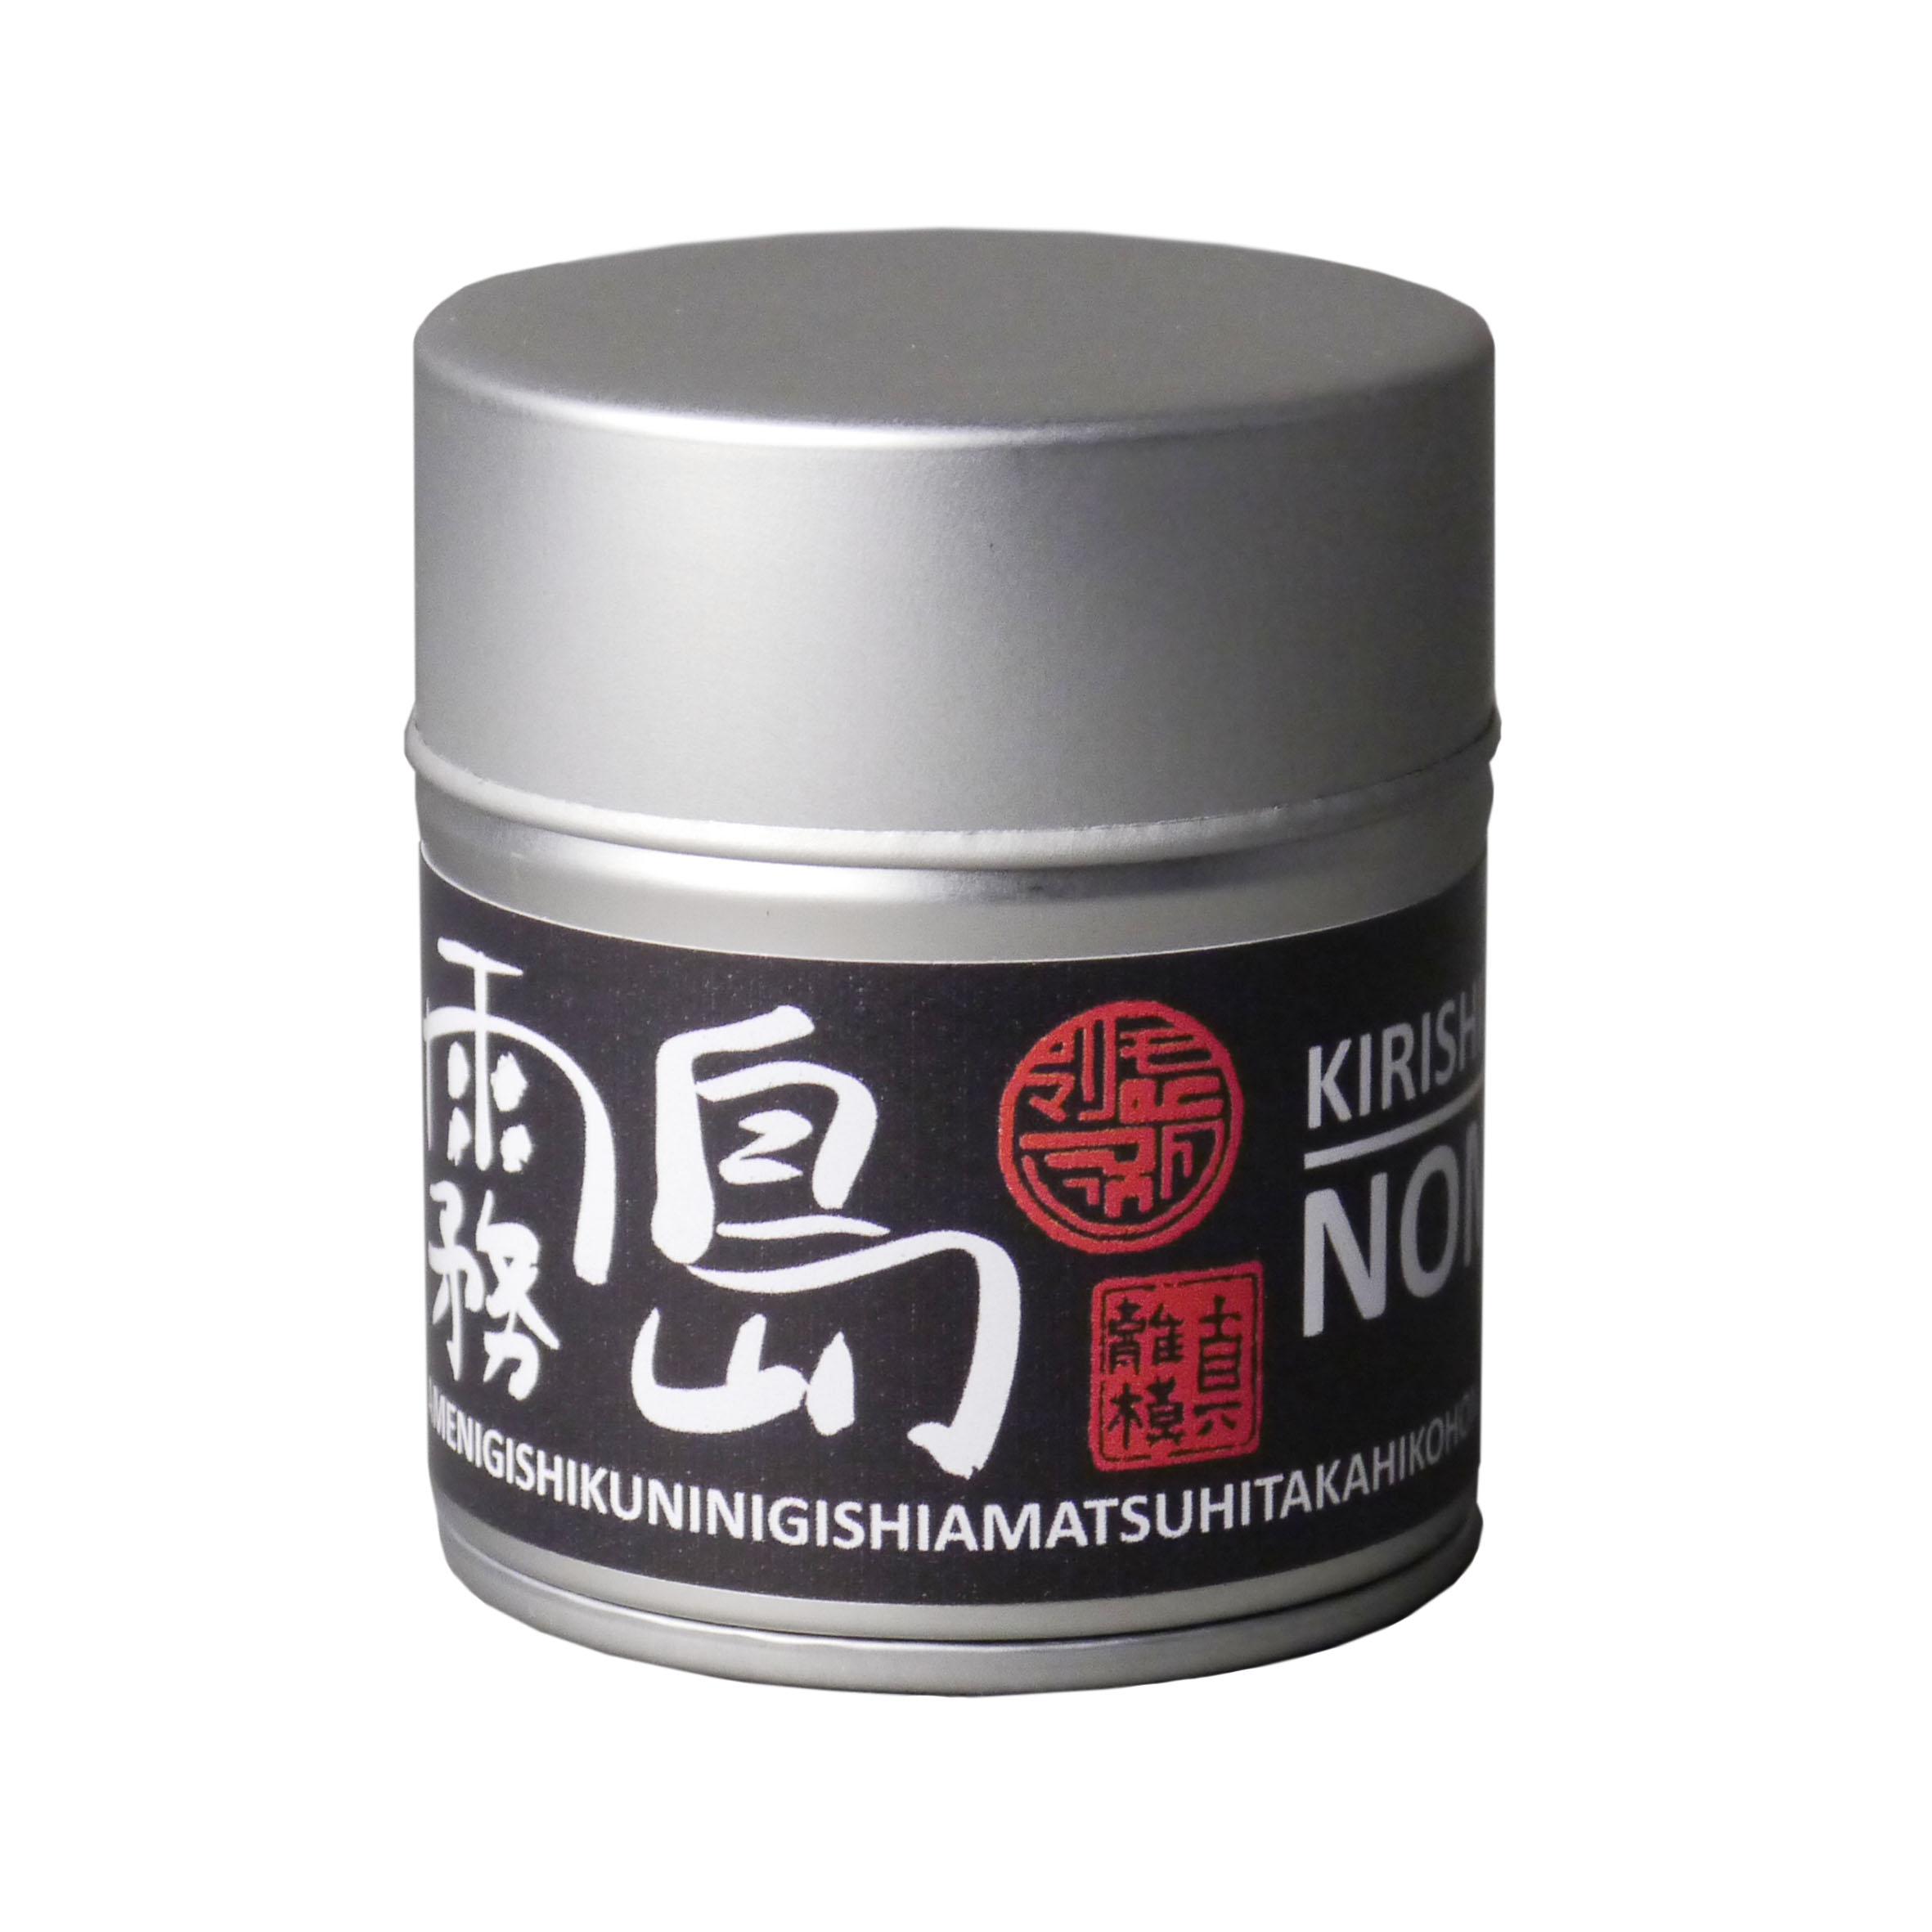 Japan Matcha KIRISHIMA NOMIKOTO BIO 20 gr.